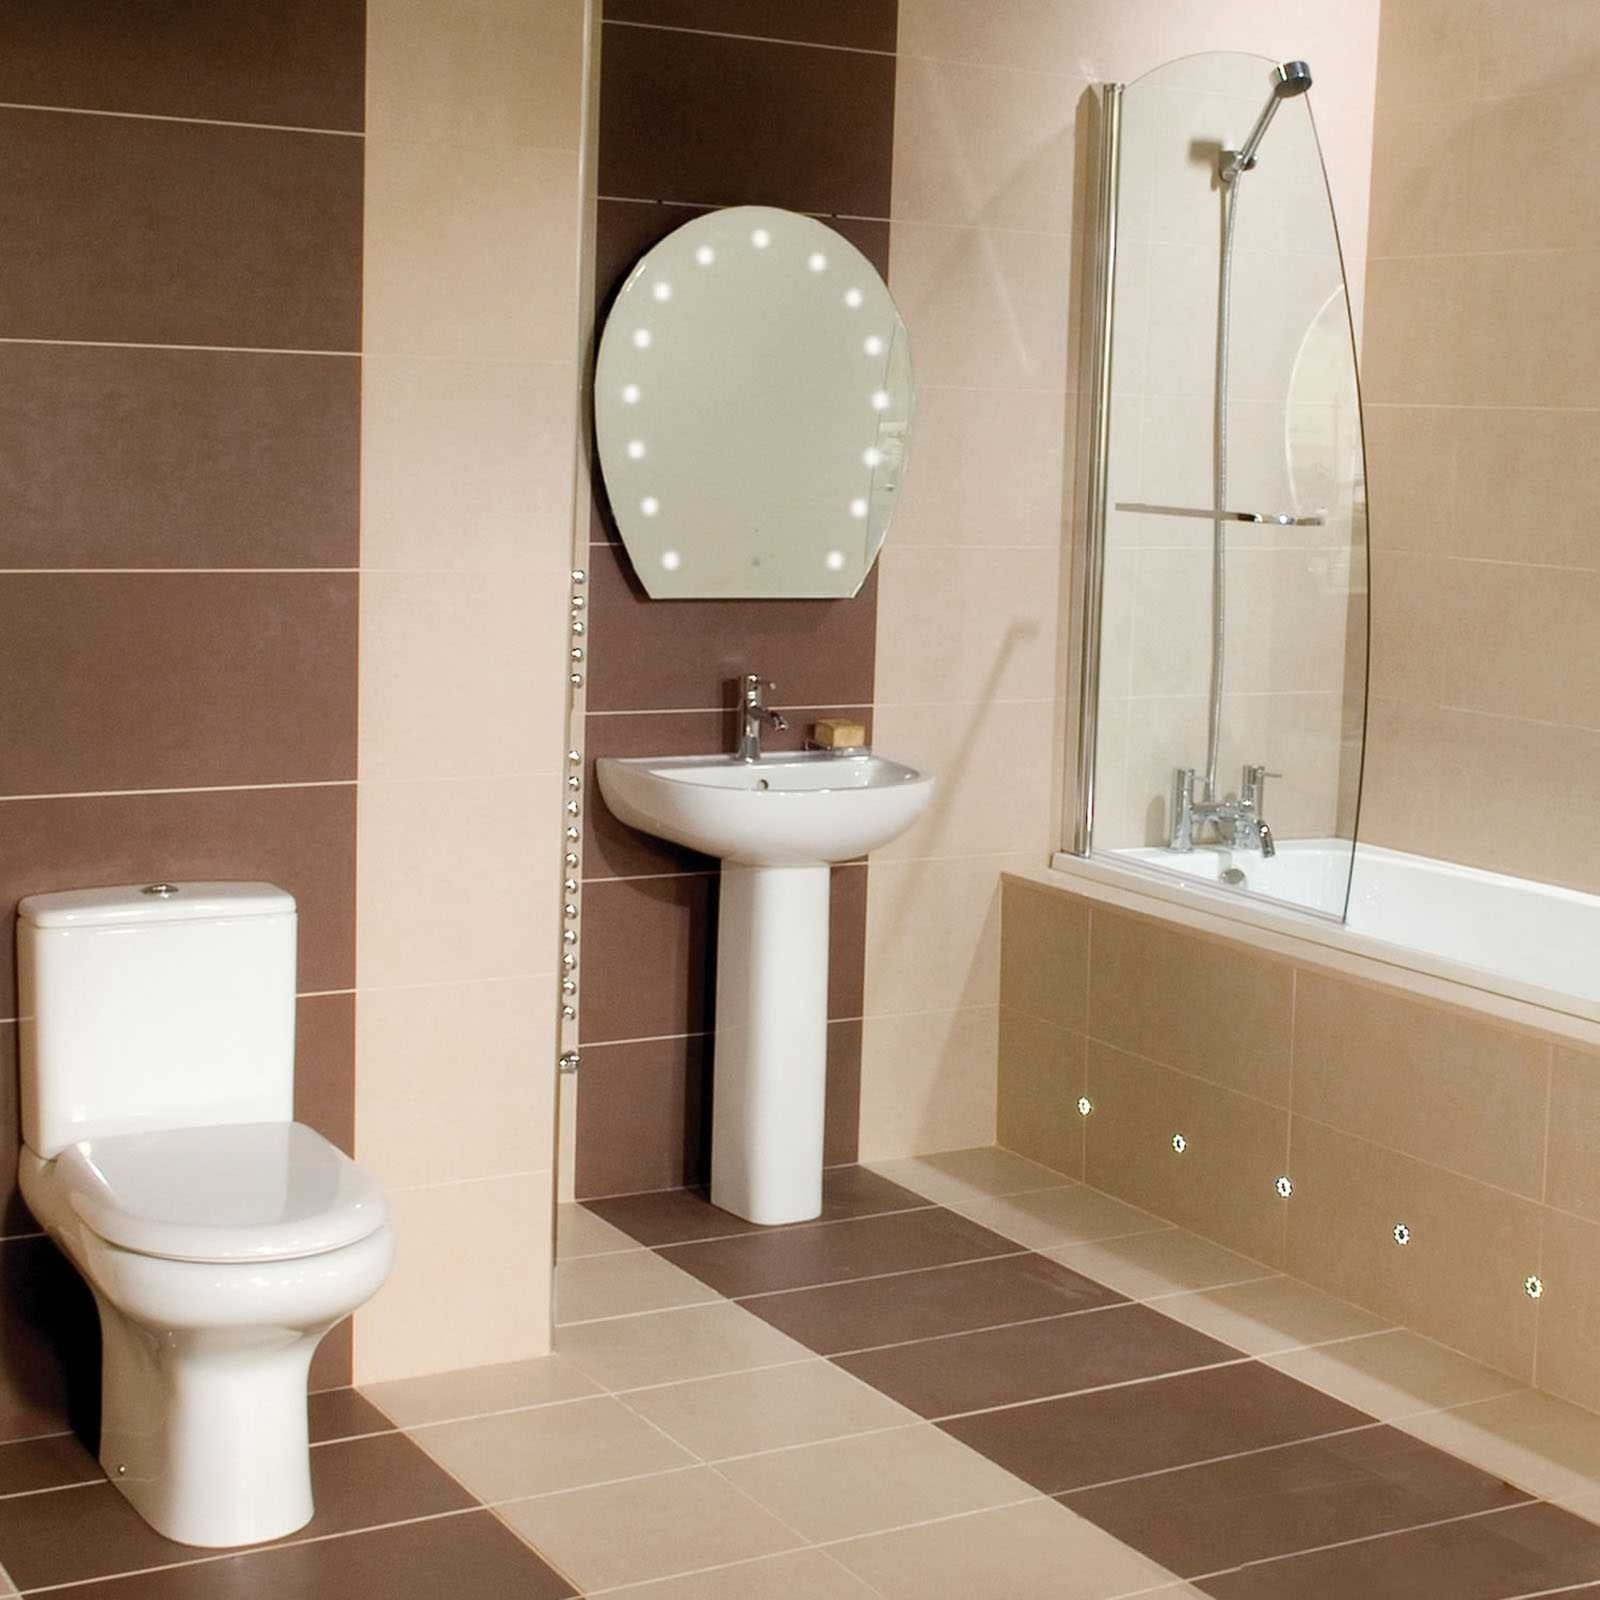 10 Amazing Bathroom Tile Ideas On A Budget bathroom tile design ideas on a budget tile designs 2020